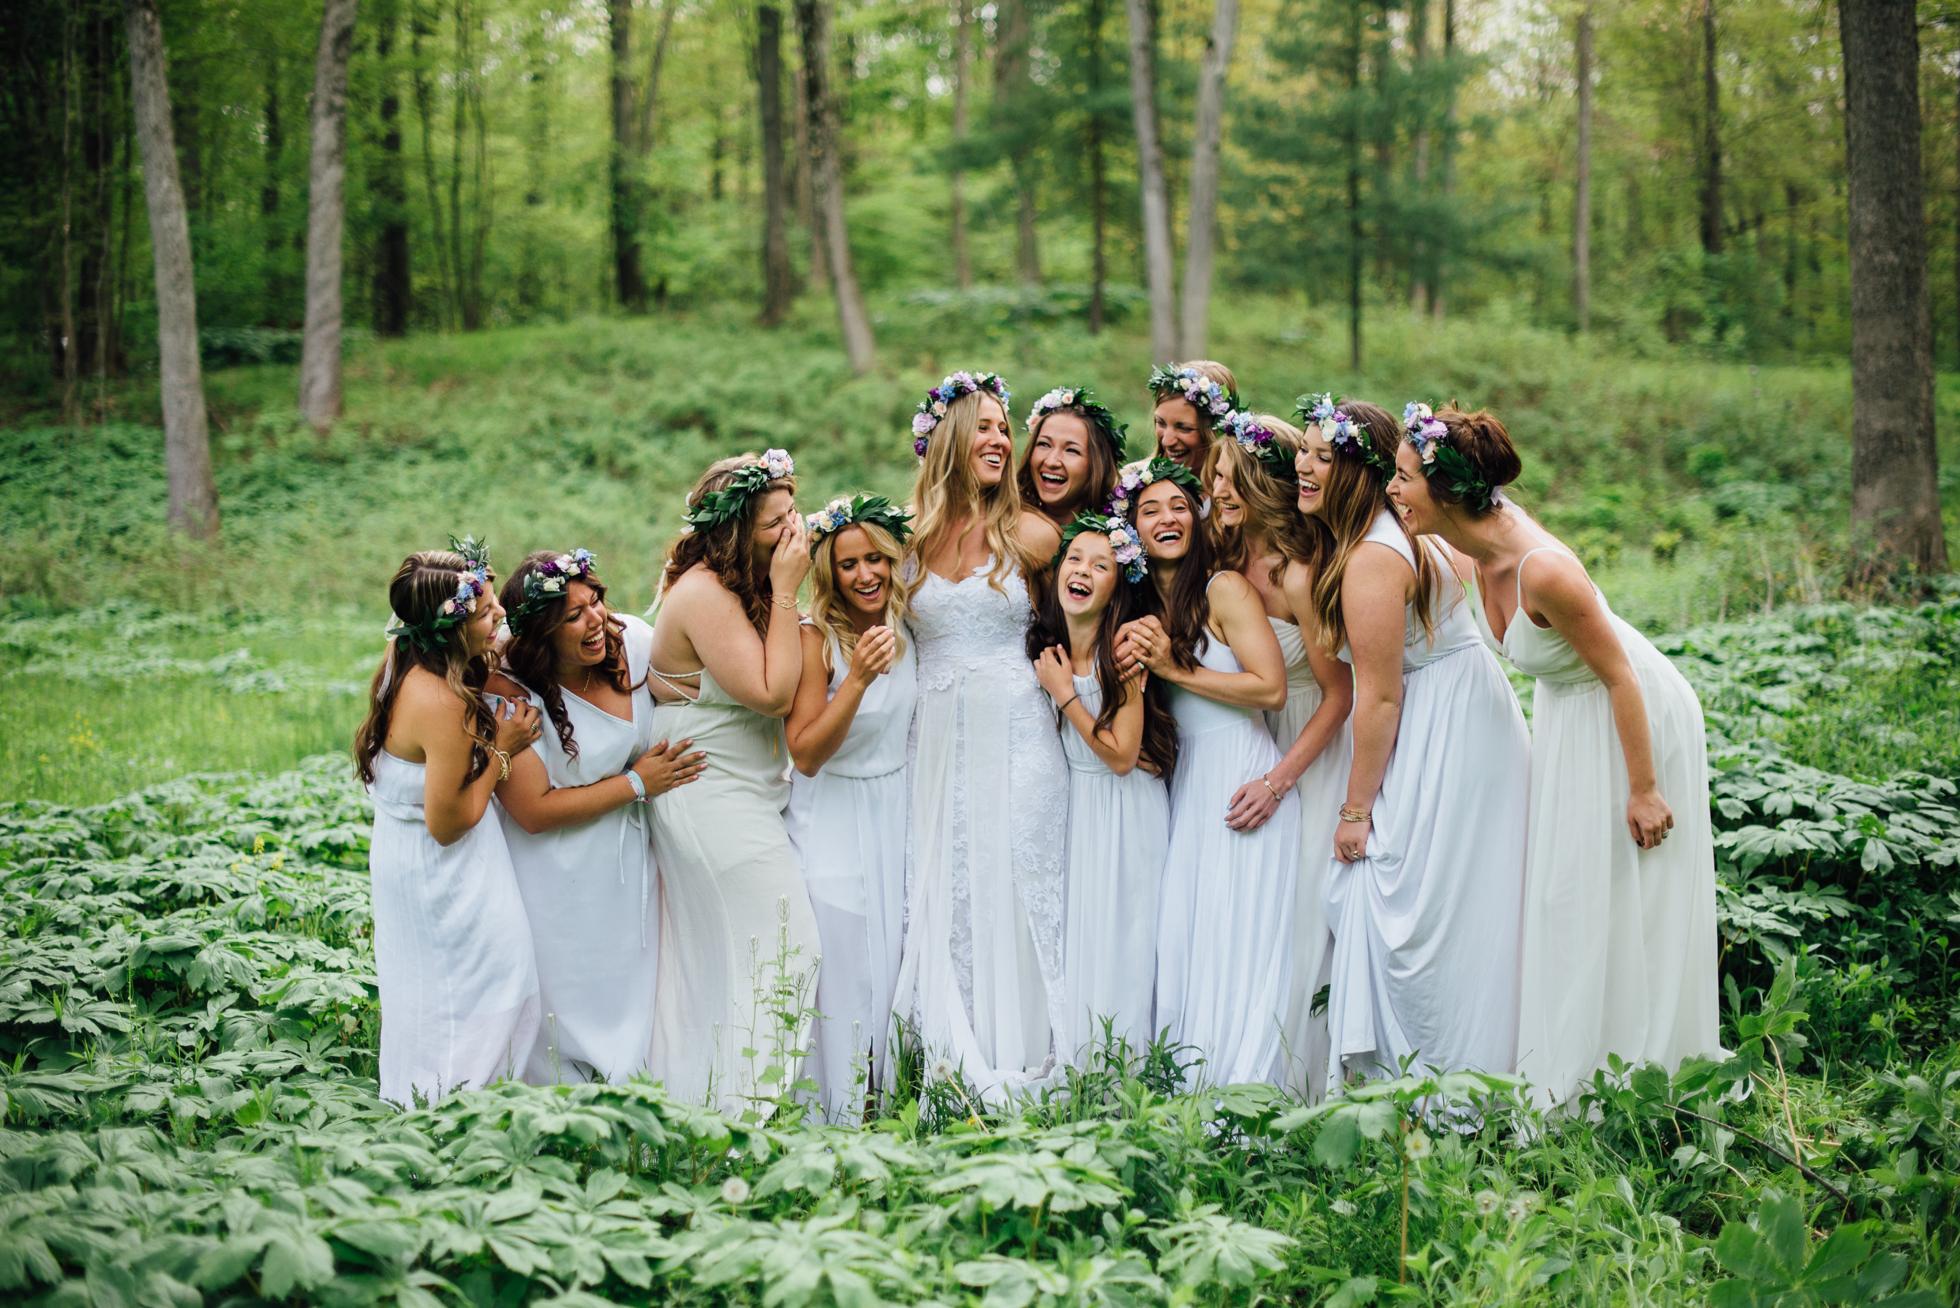 Fernwood Hills London Ontario Bohemian Wedding photographed by Sara Monika, Photographer - free-spirited boho bride with flower crown - Grace Loves Lace wedding dress - bridesmaids wearing white